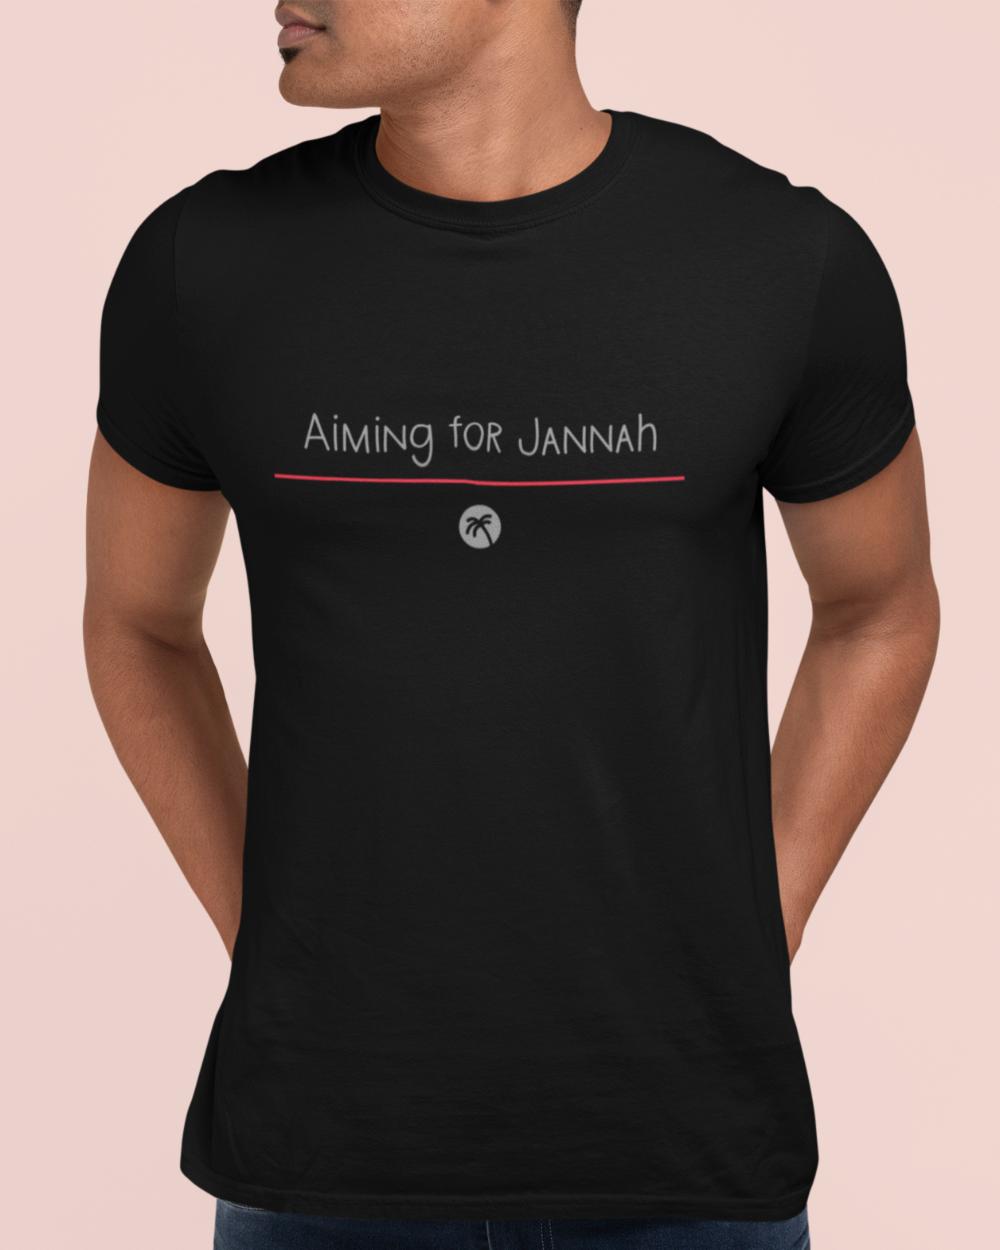 Aiming for jannah